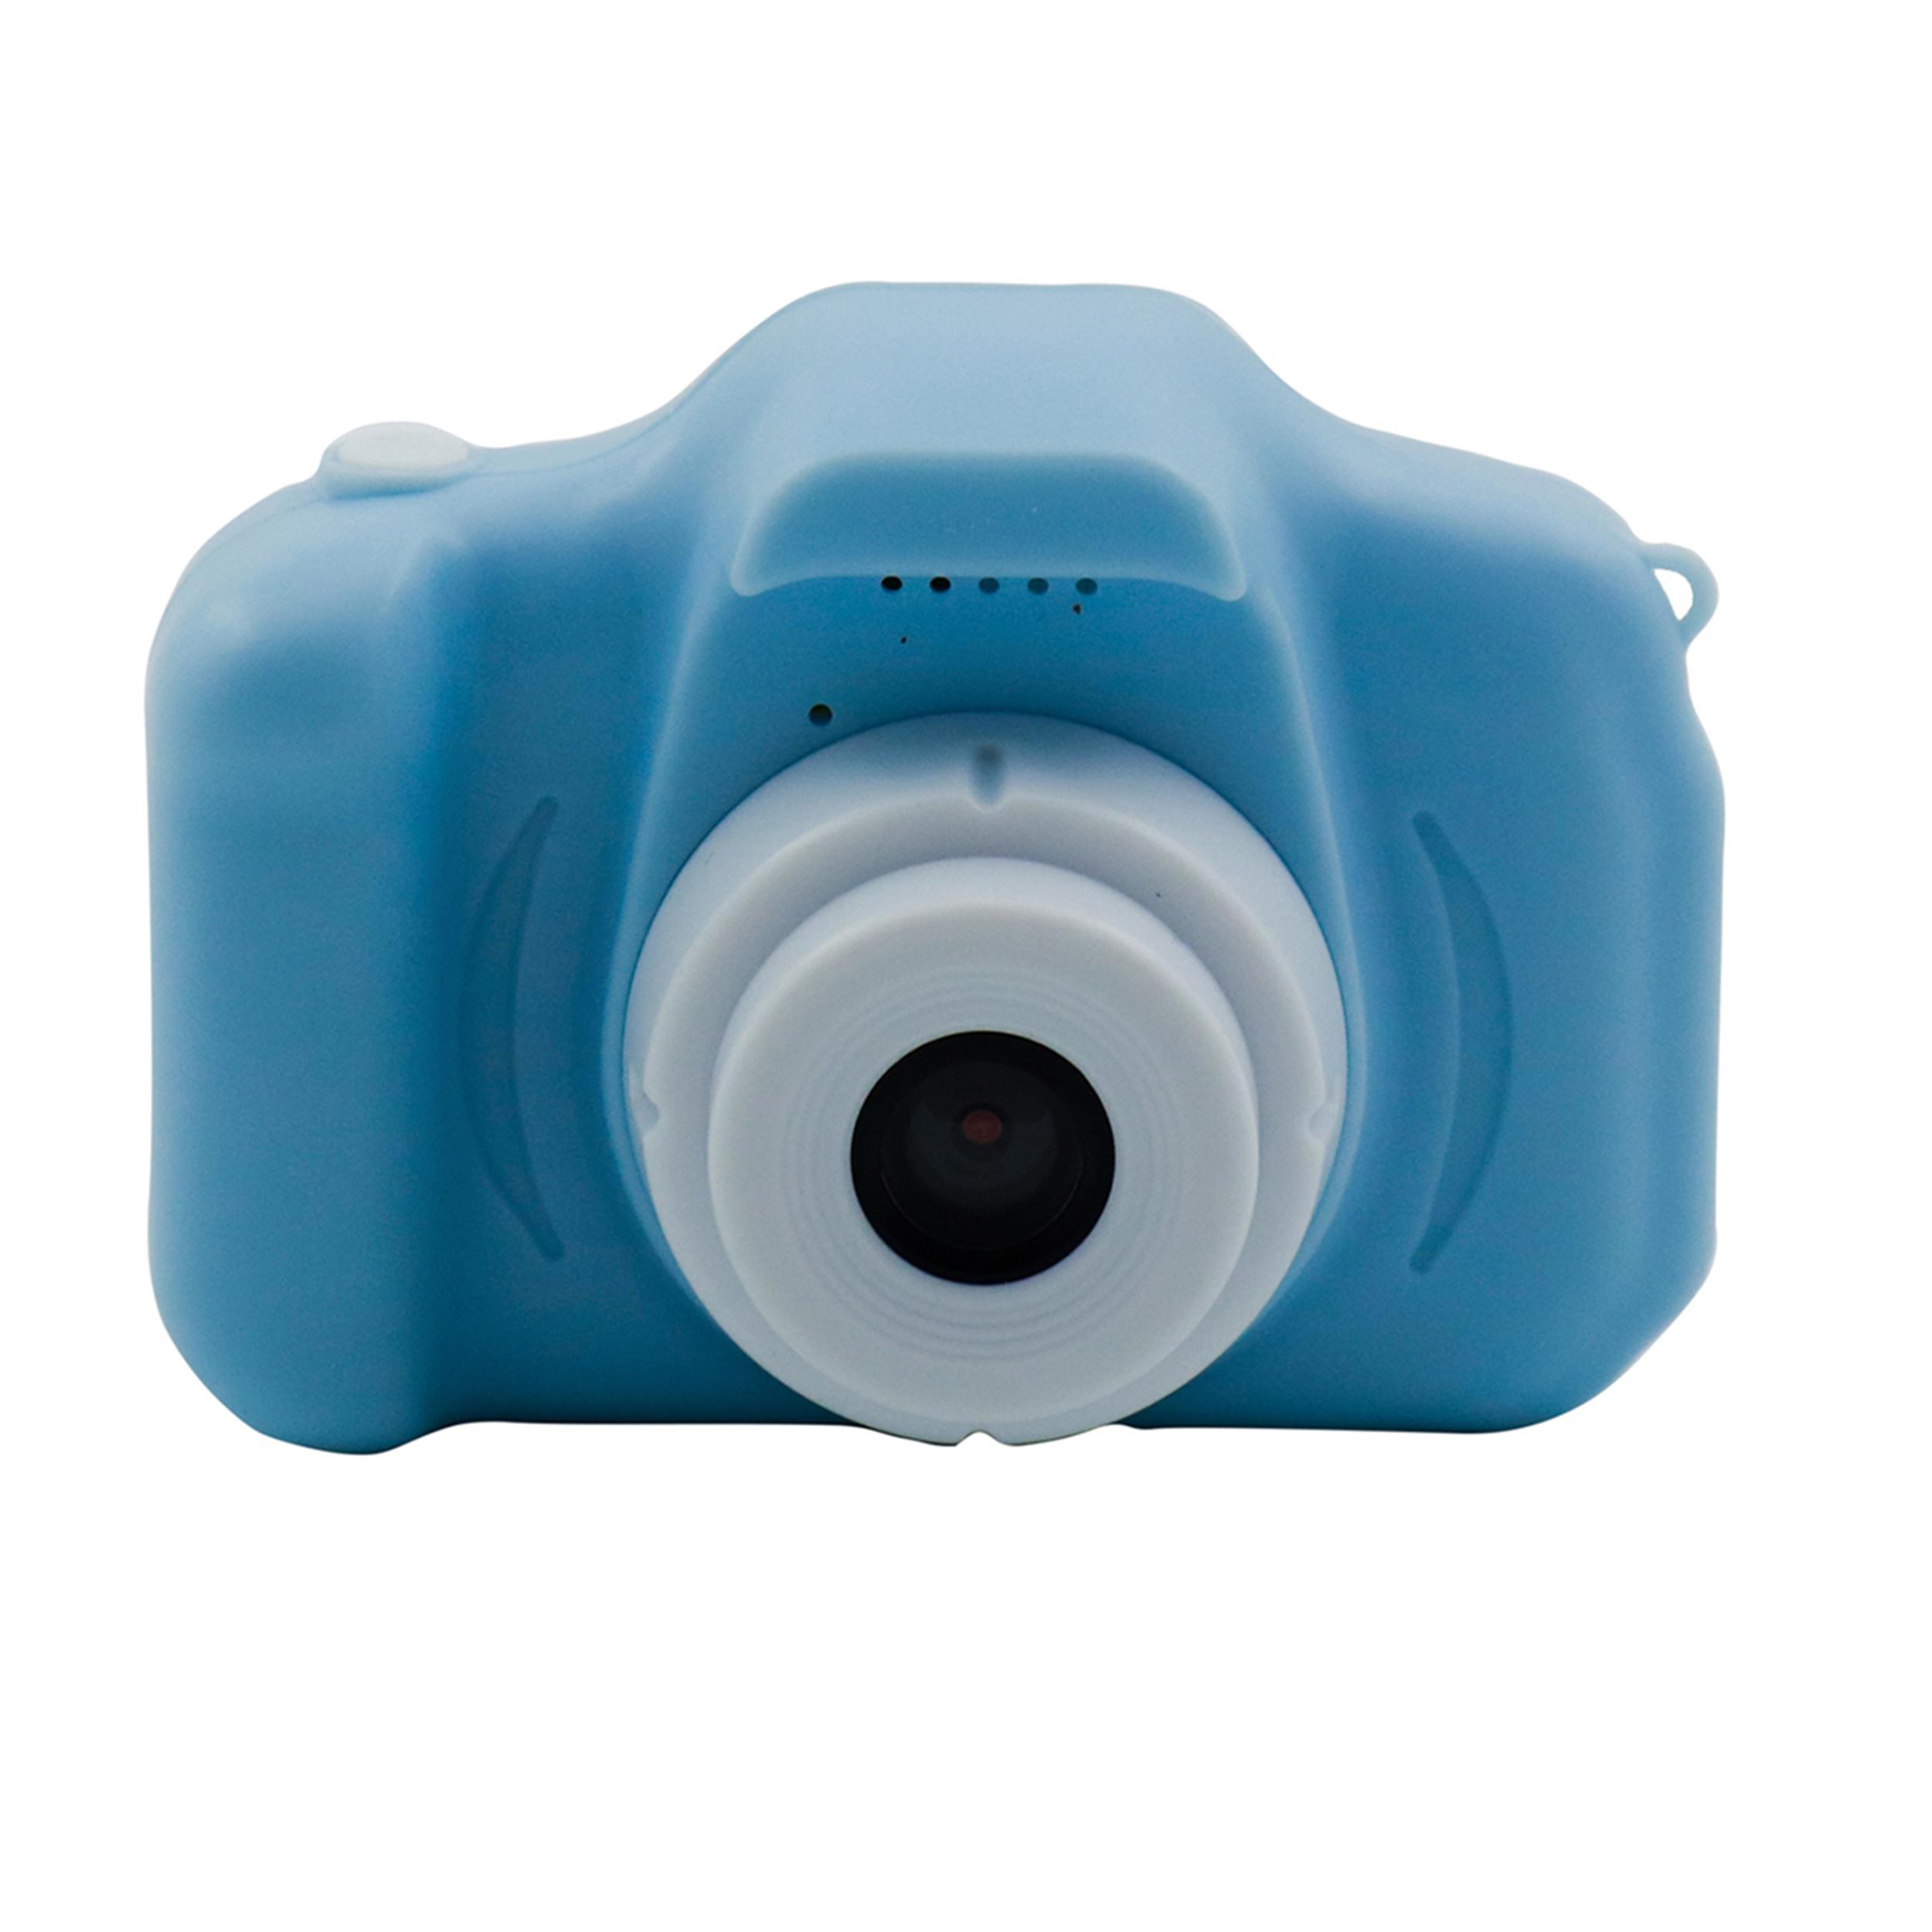 دوربین دیجیتال مدل KLM87